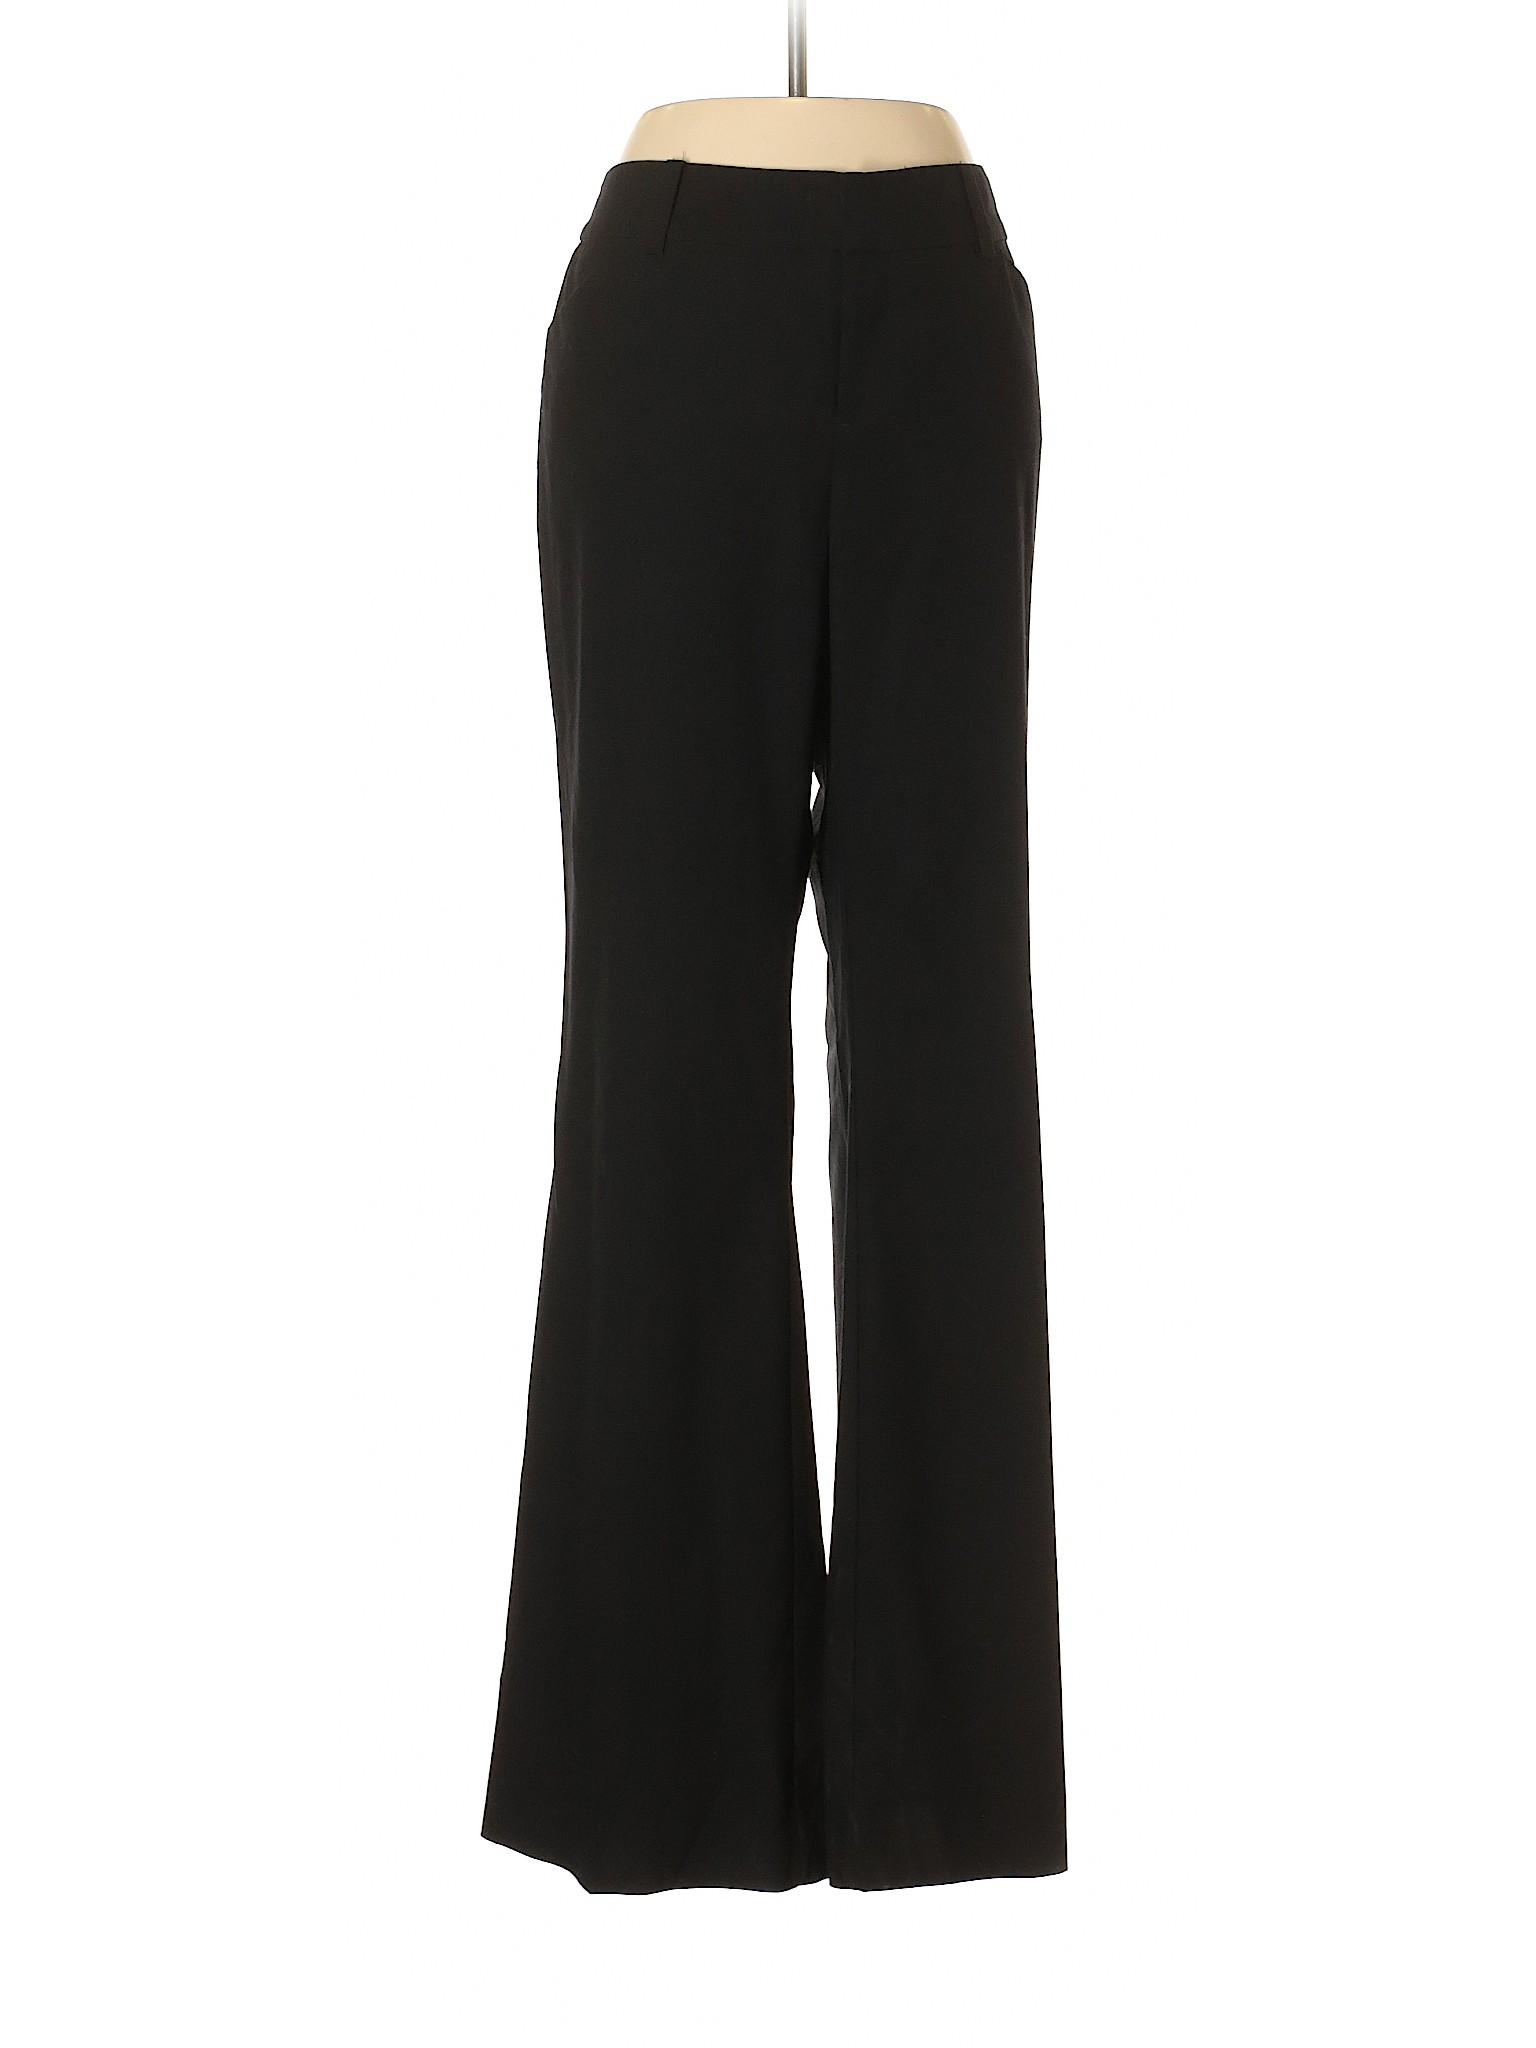 Leisure winter Pants Dress INC International Concepts 4gOUw